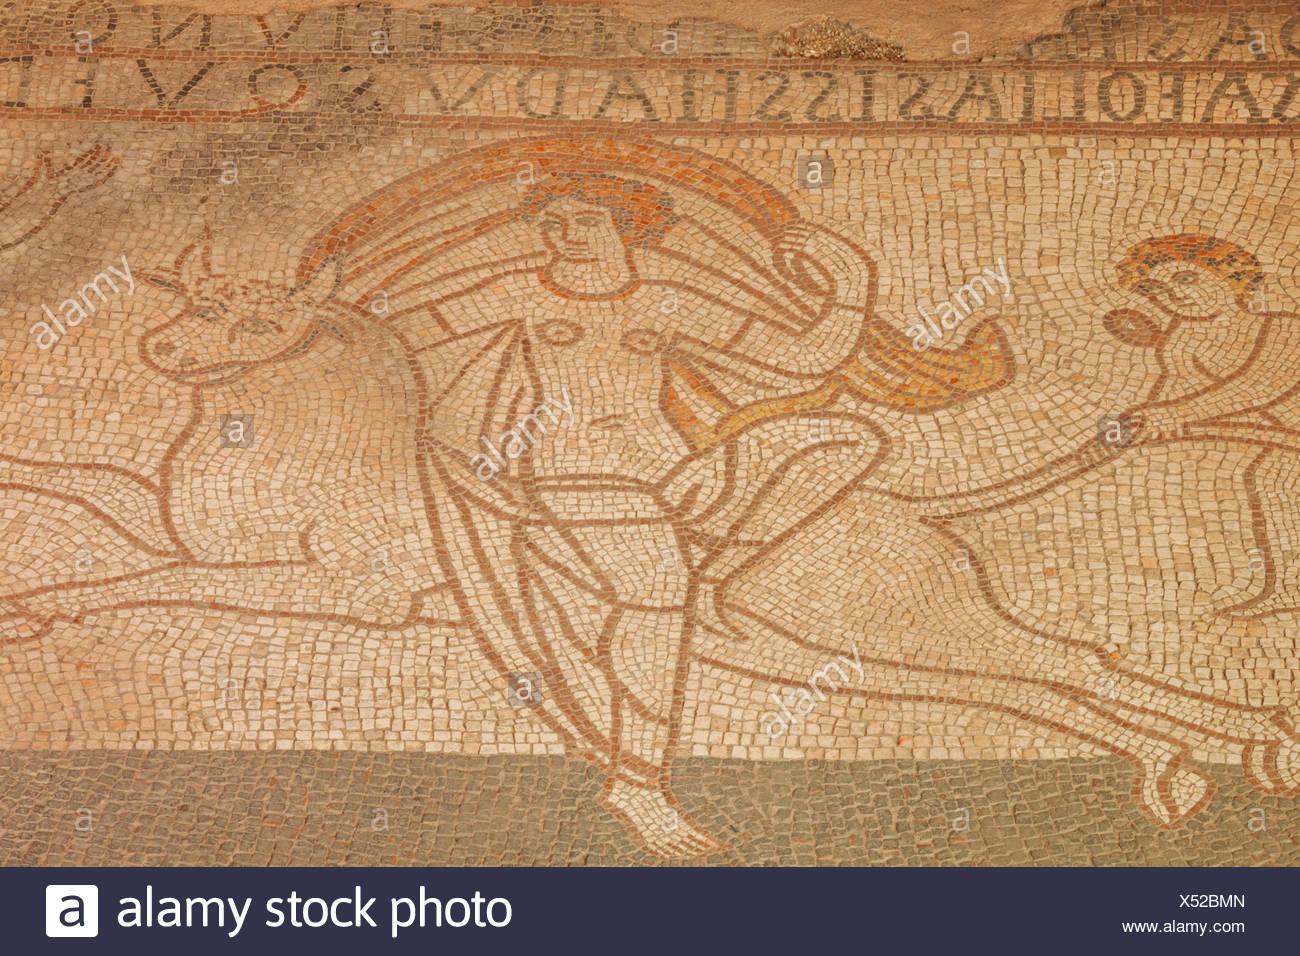 England, Kent, Lullingstone Roman Villa, Detail of Mosaic Flooring Showing The Roman God Jupiter Abducting Princess Europa while Disguised as a Bull - Stock Image